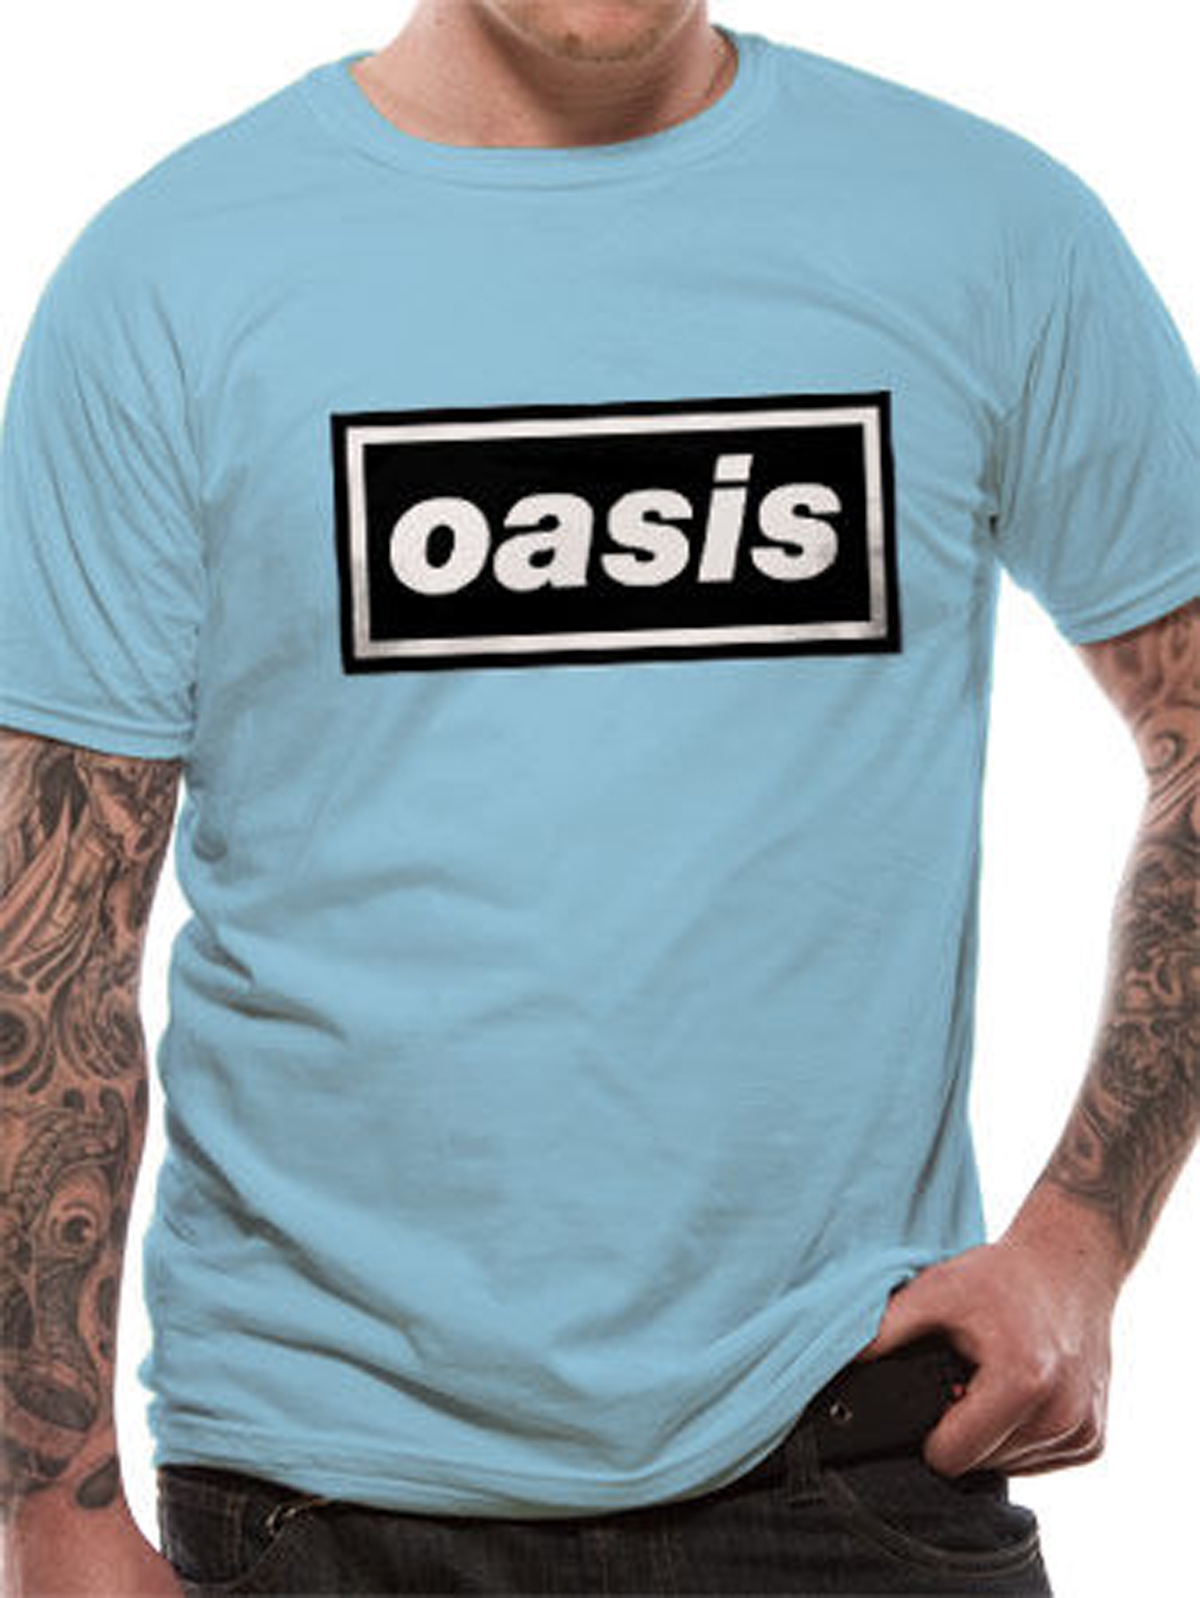 9bf5811364276 Blue Oasis Logo Liam Noel Gallagher Rock Licensed Tee T-Shirt Men